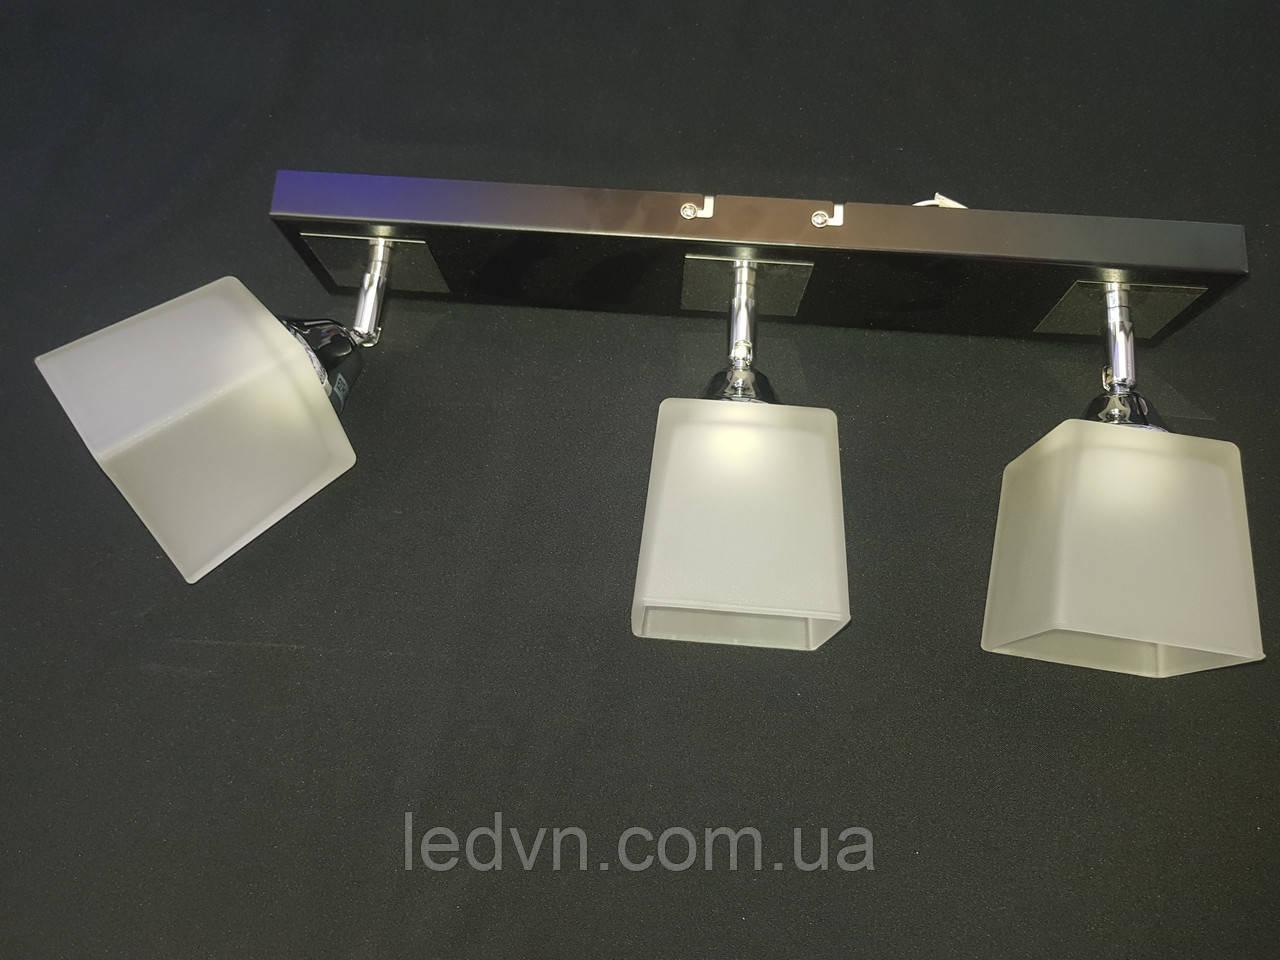 Припотолочная люстра на 3 лампы поворотные плафоны квадраты